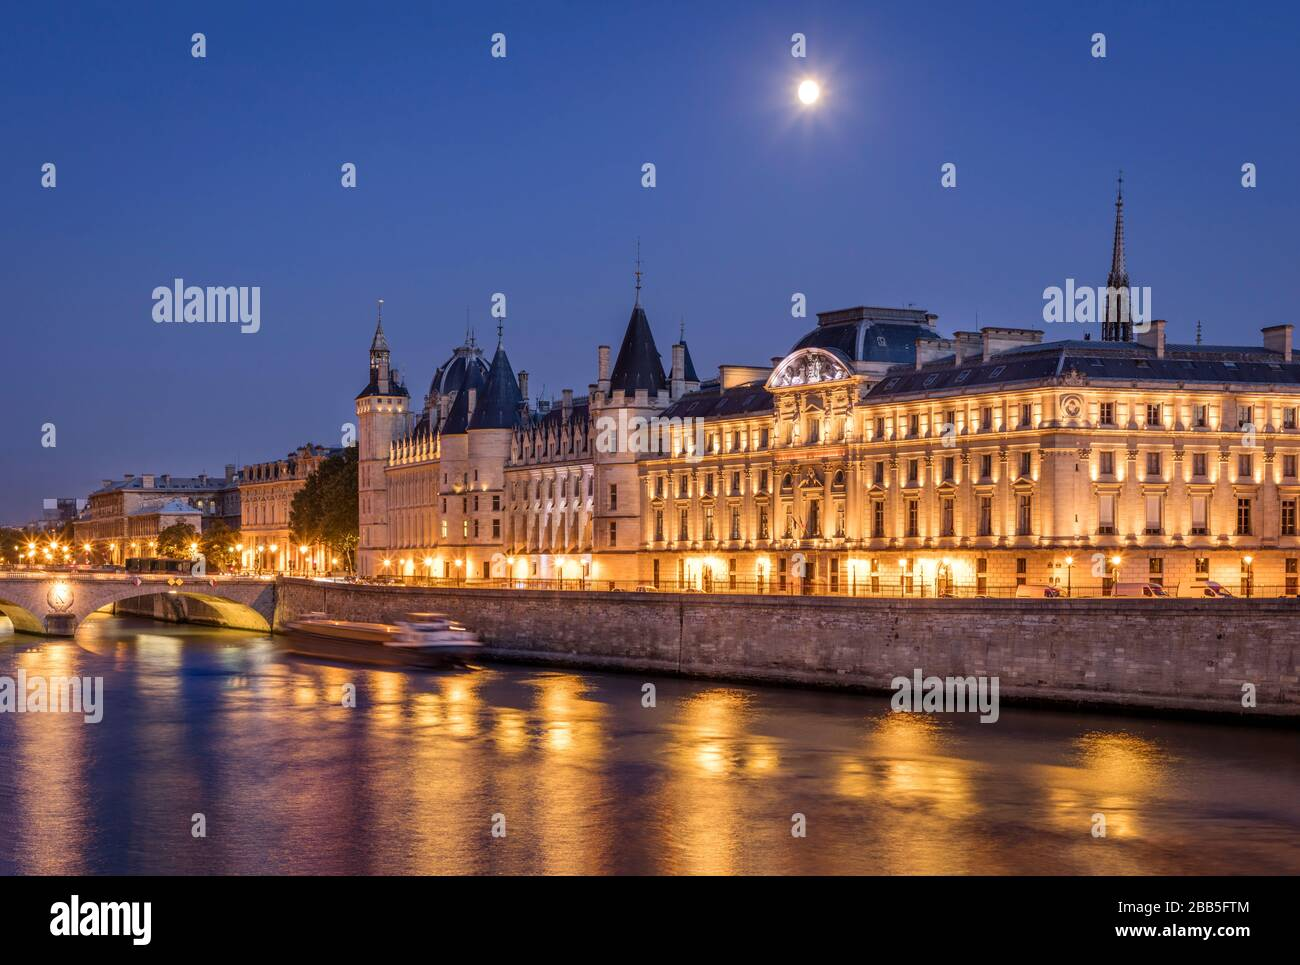 River Seine and the Conciergerie at twilight, Paris, France Stock Photo